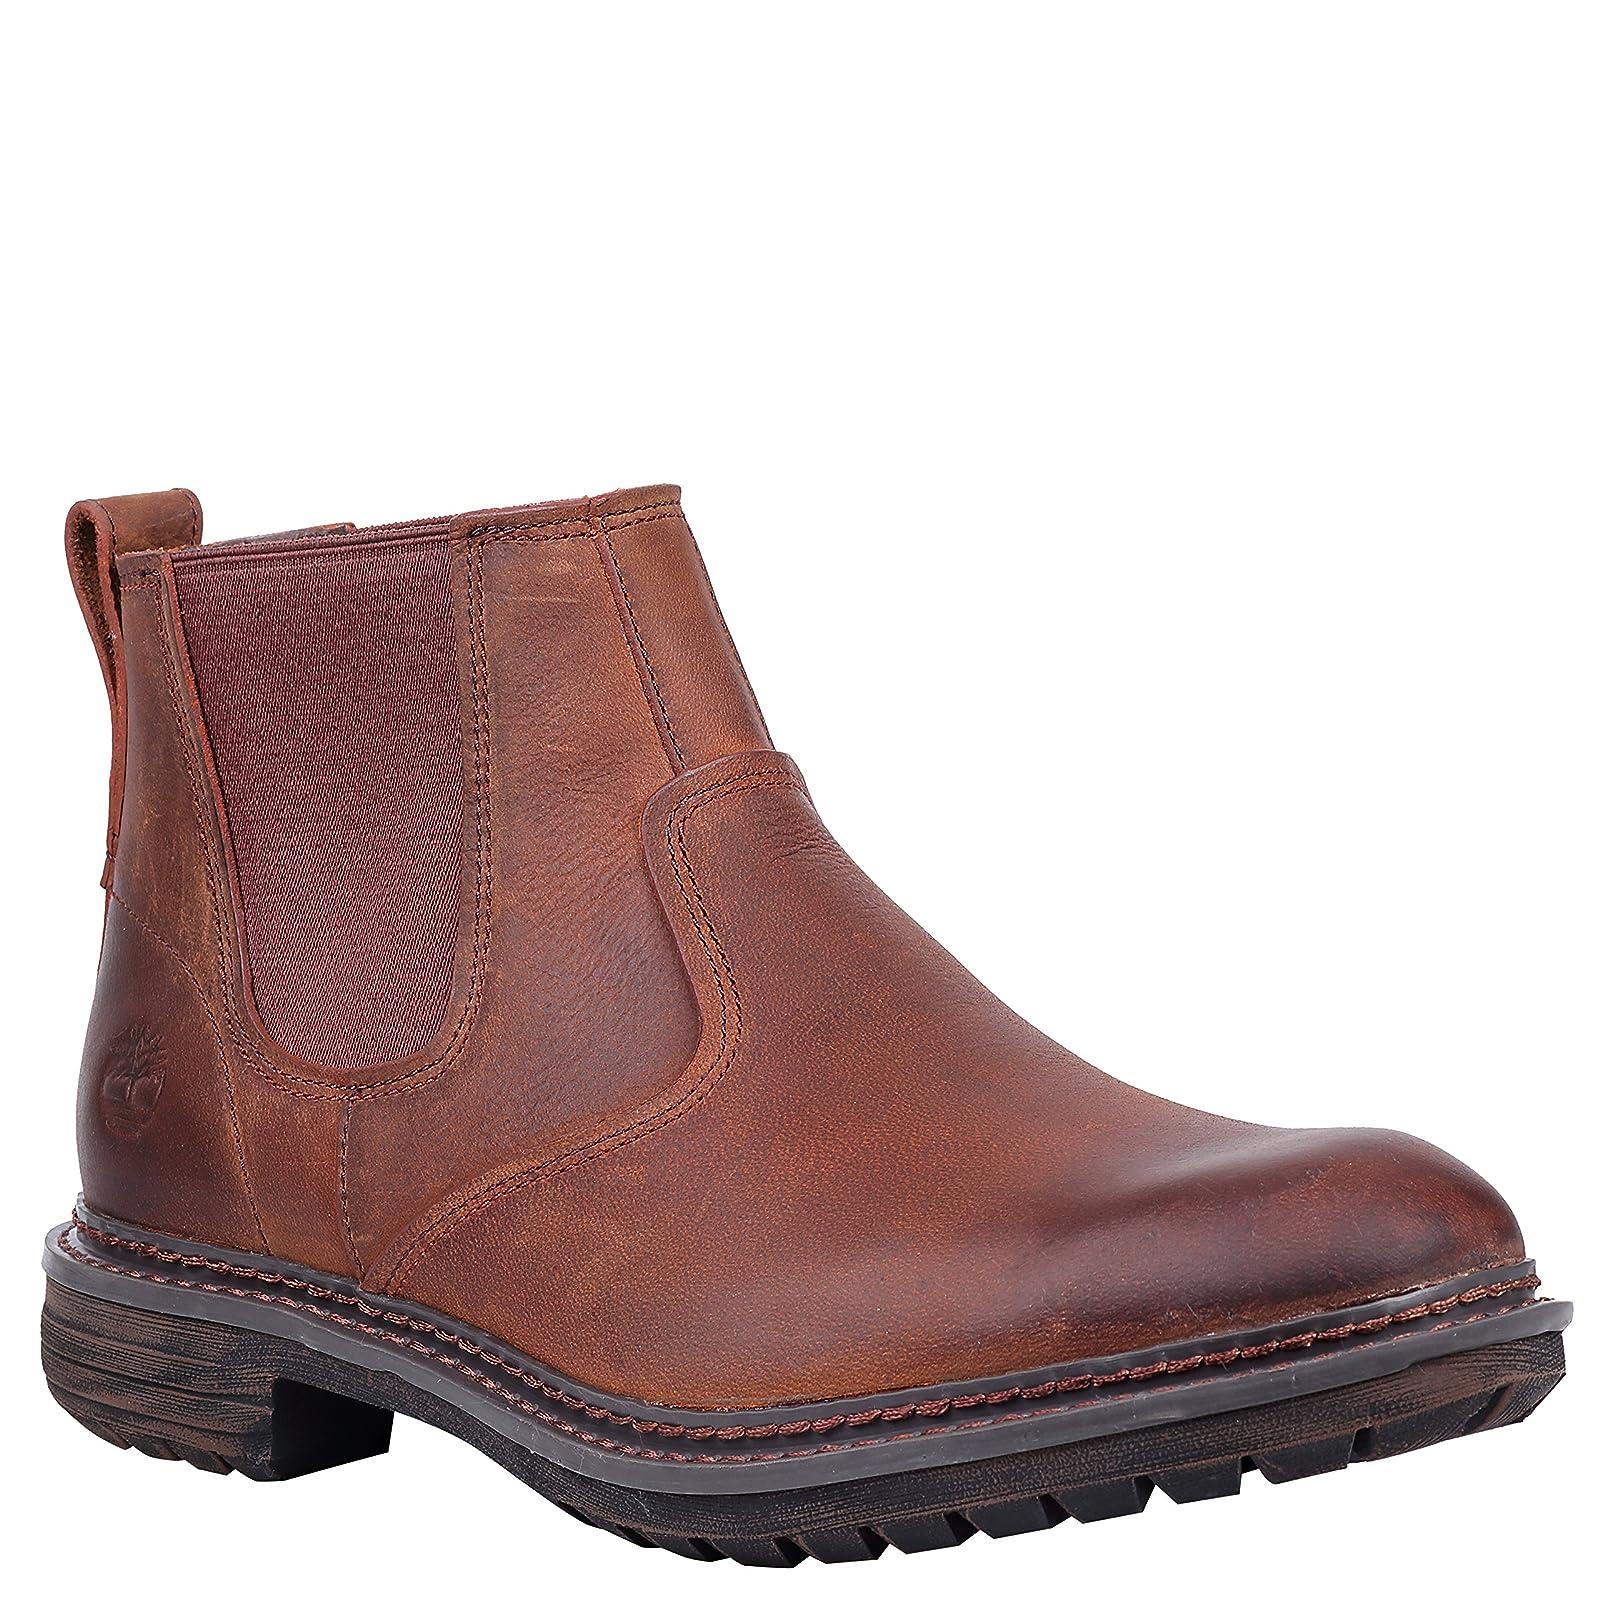 Timberland Men's Logan Bay Chelsea Boot A1V4Z Medium Brown Full Grain - 2